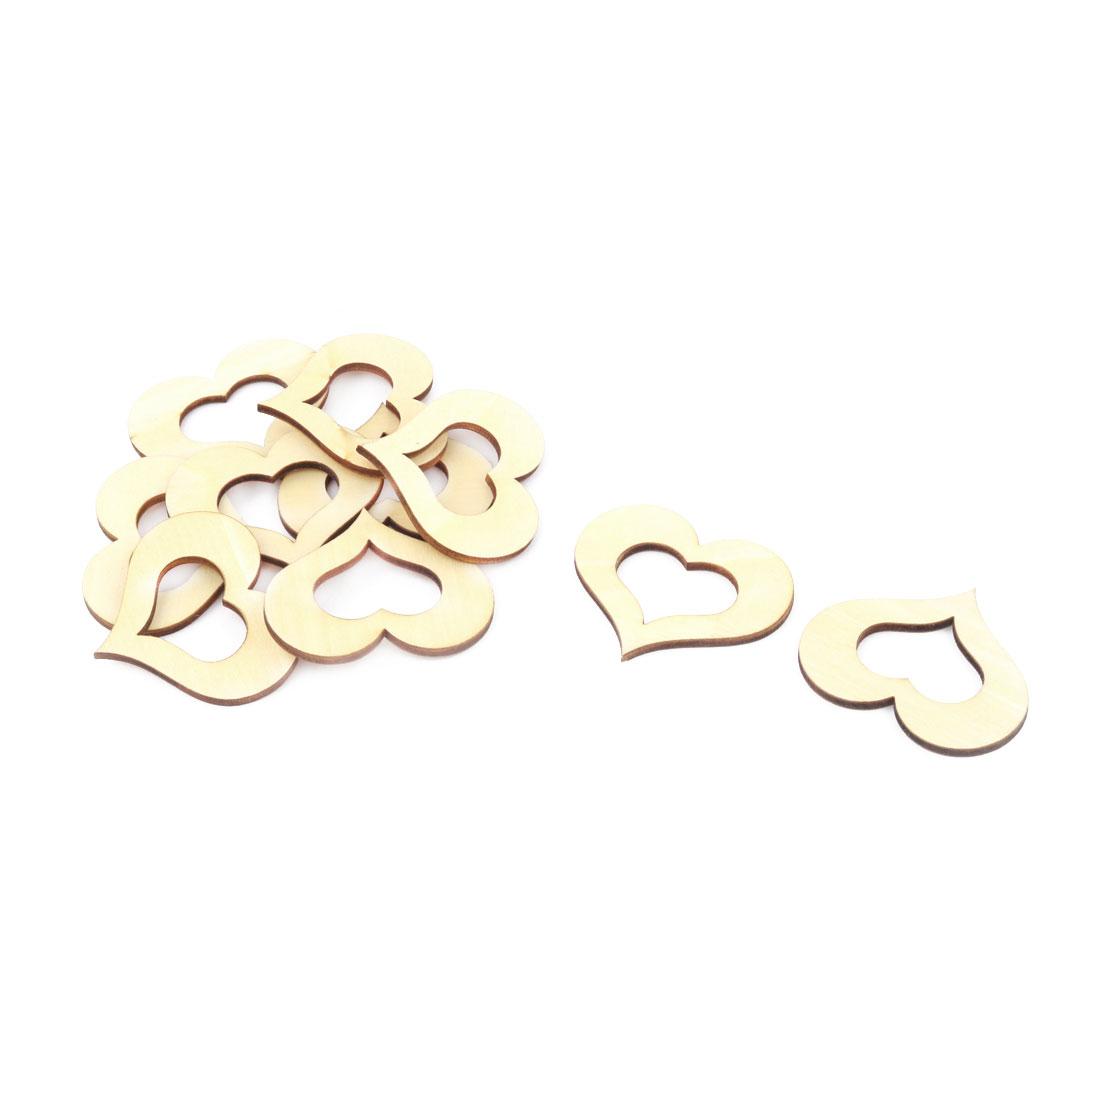 Wooden Love Heart Shaped Hollow Design Wedding Decor DIY Accessories Beige 45 x 40mm 10pcs